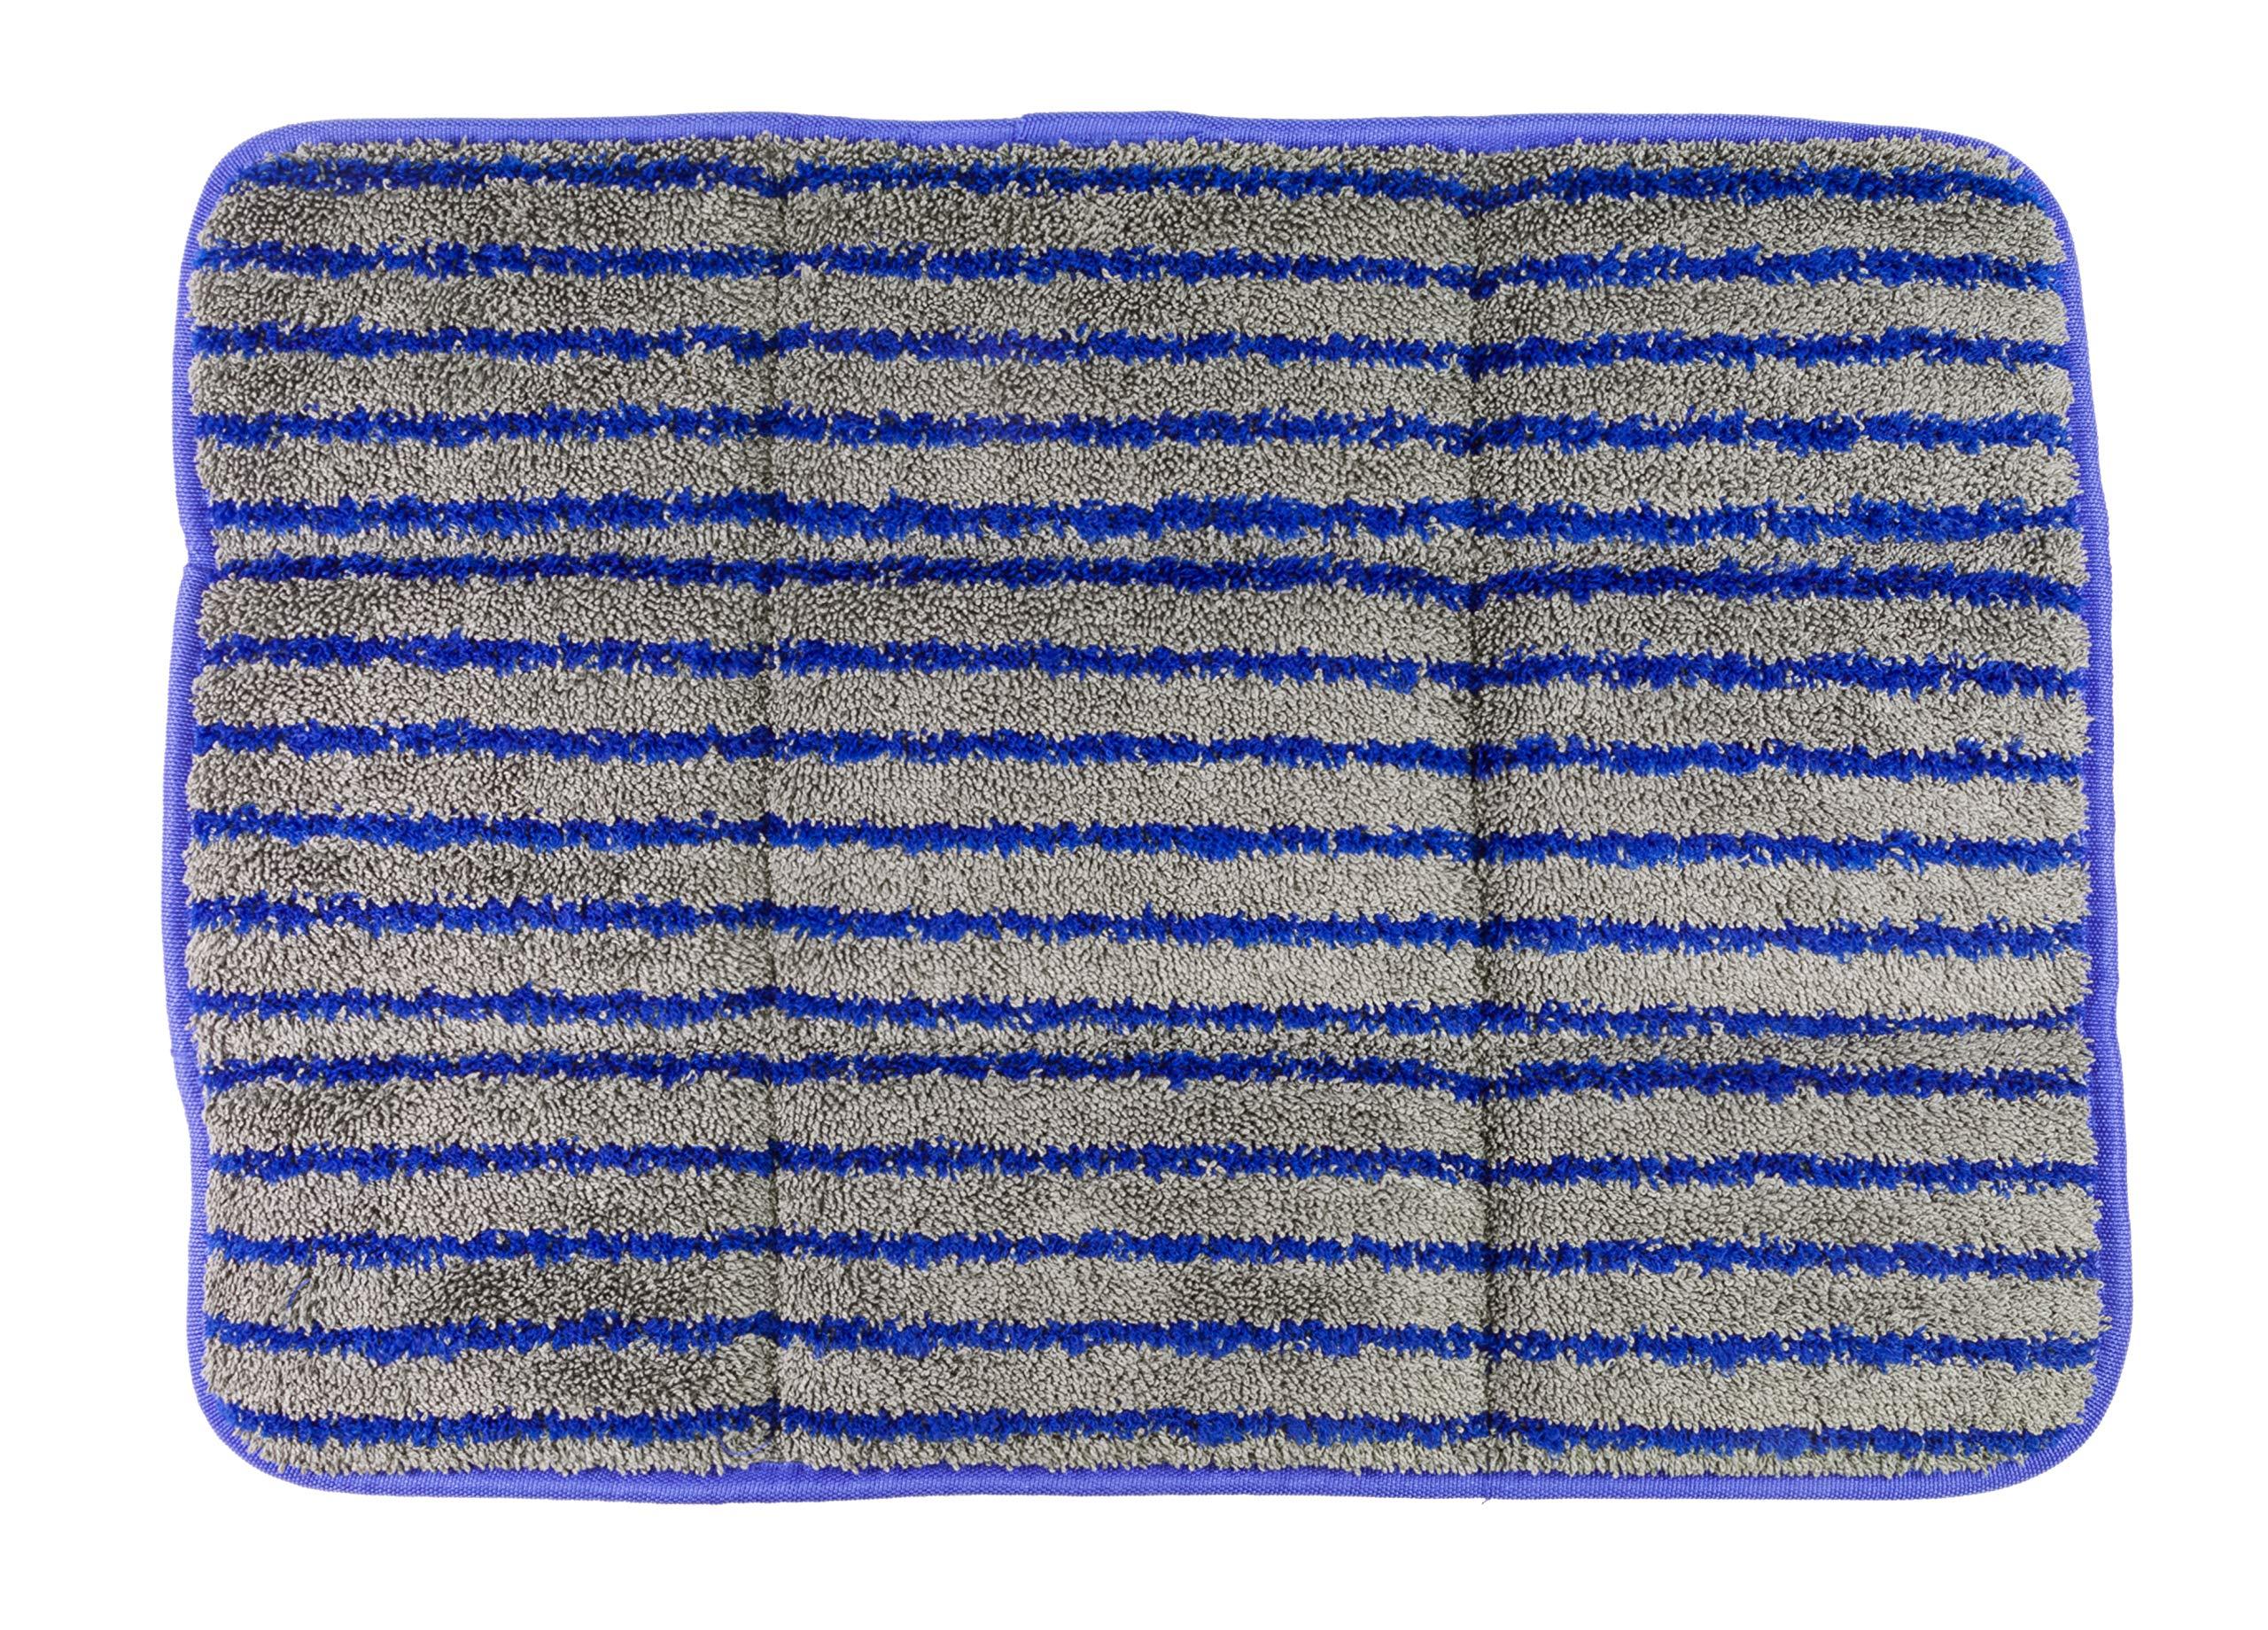 Square Scrub Microfiber Carpet Pad by Square Scrub